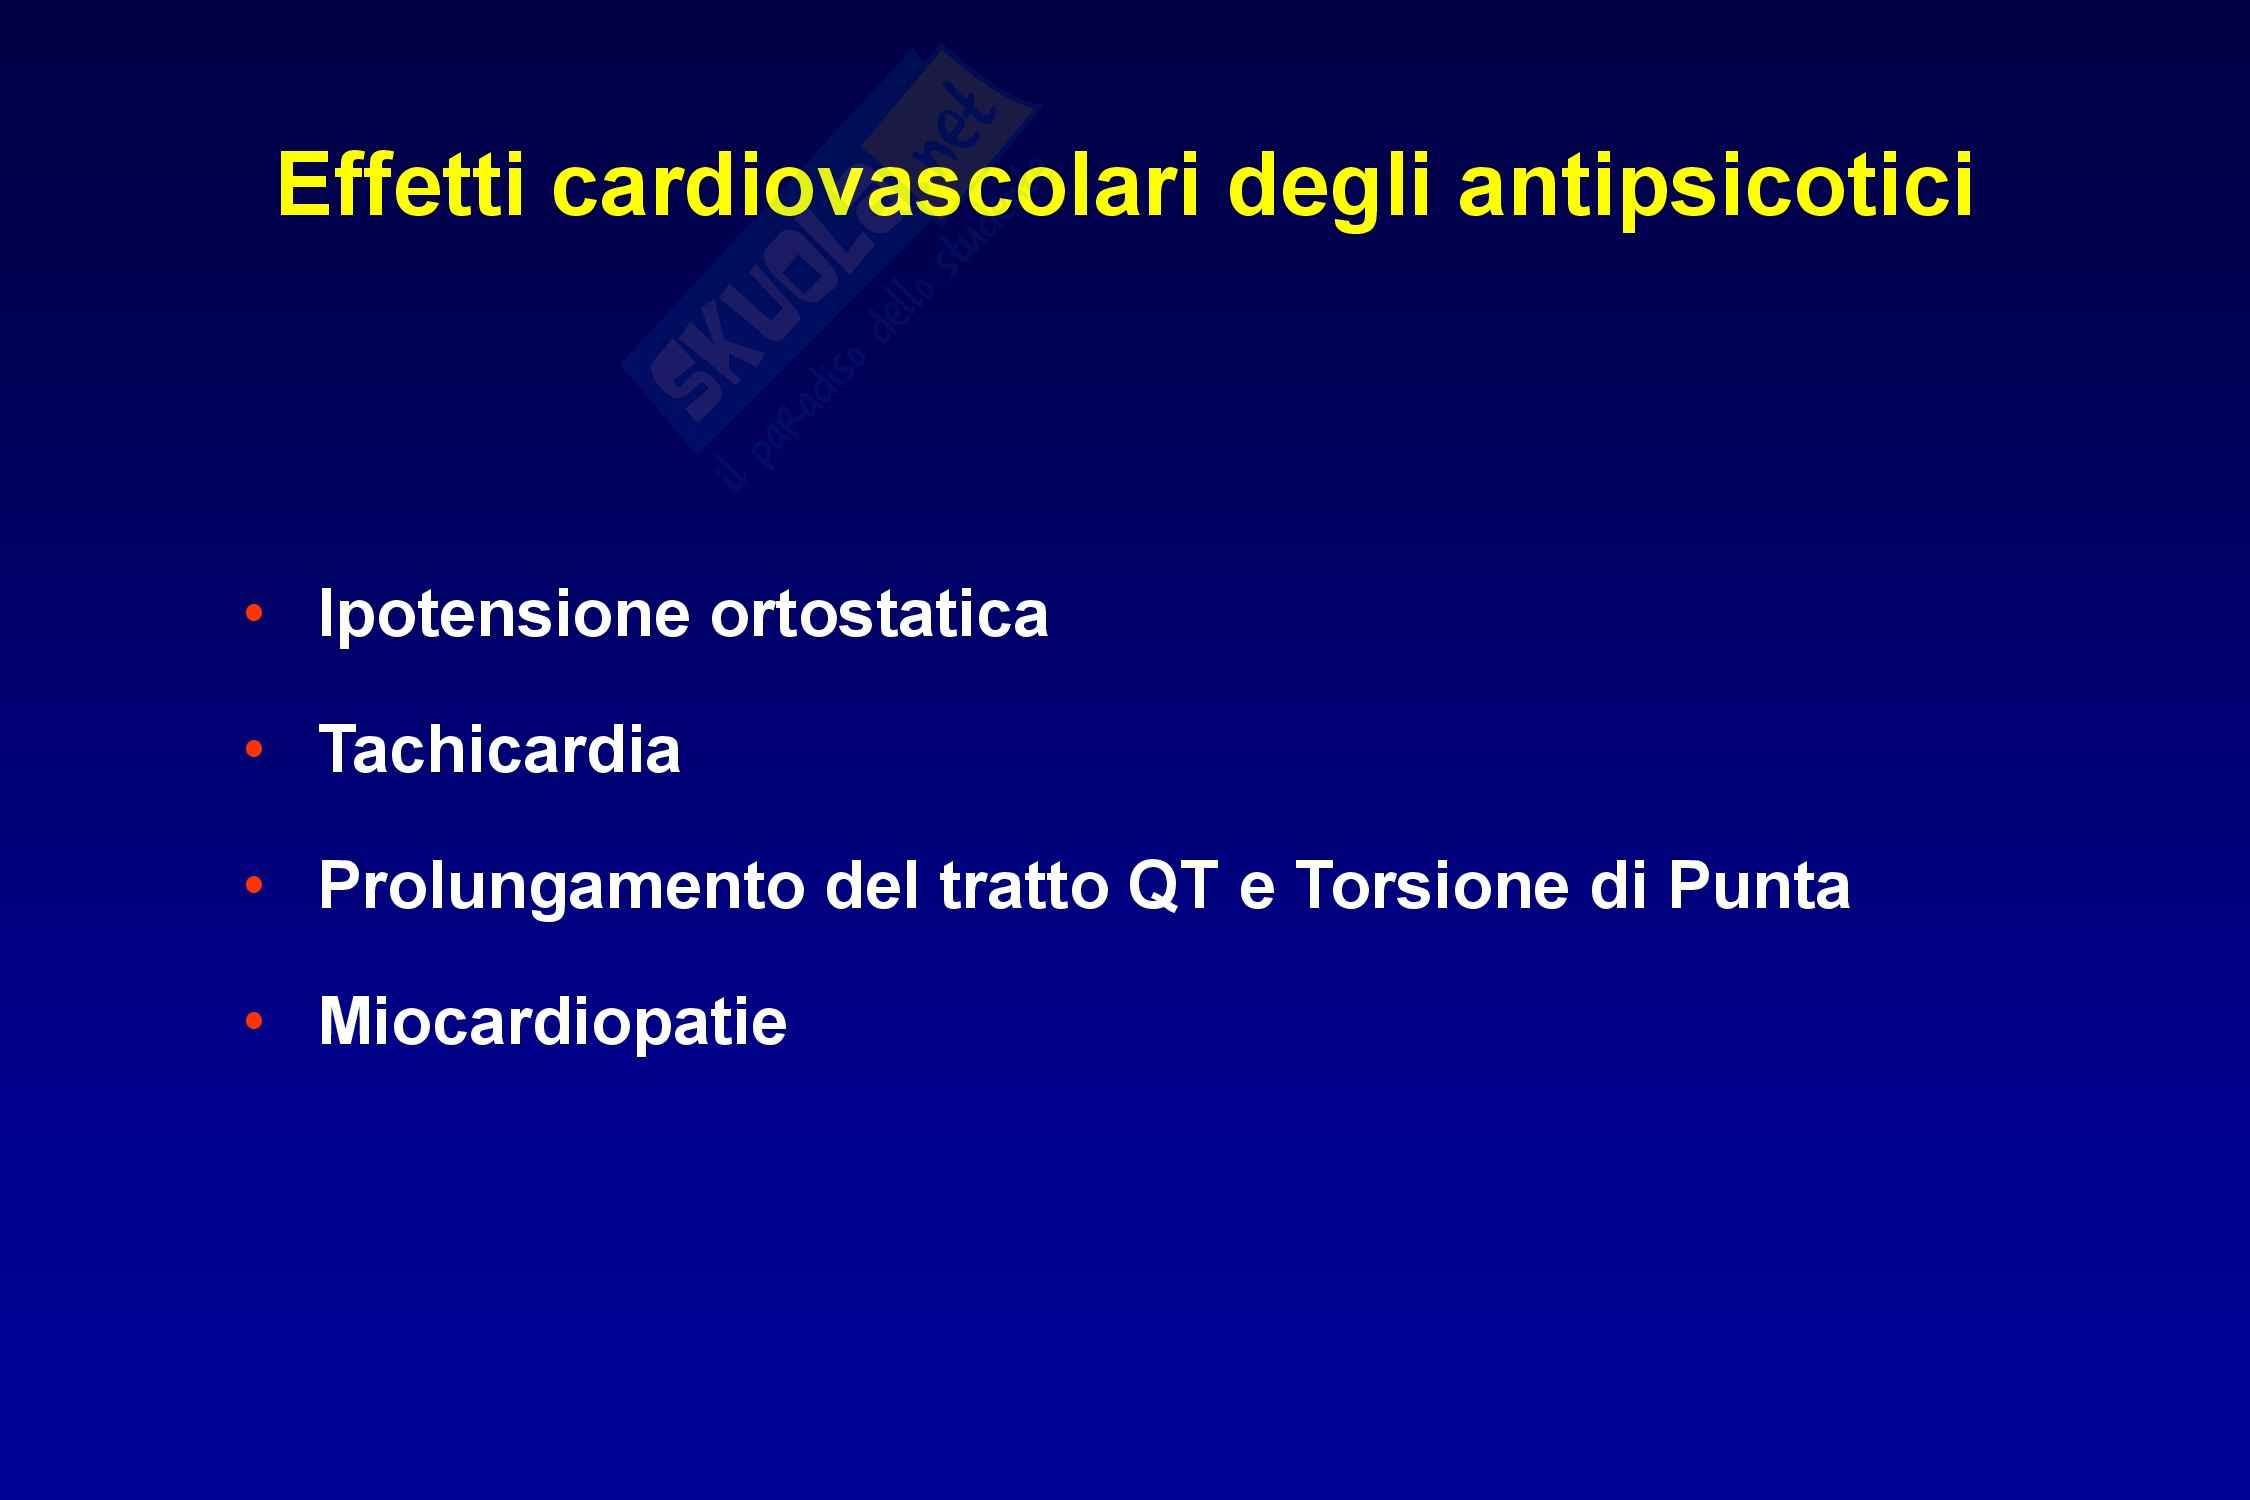 Farmaci antipsicotici Pag. 46